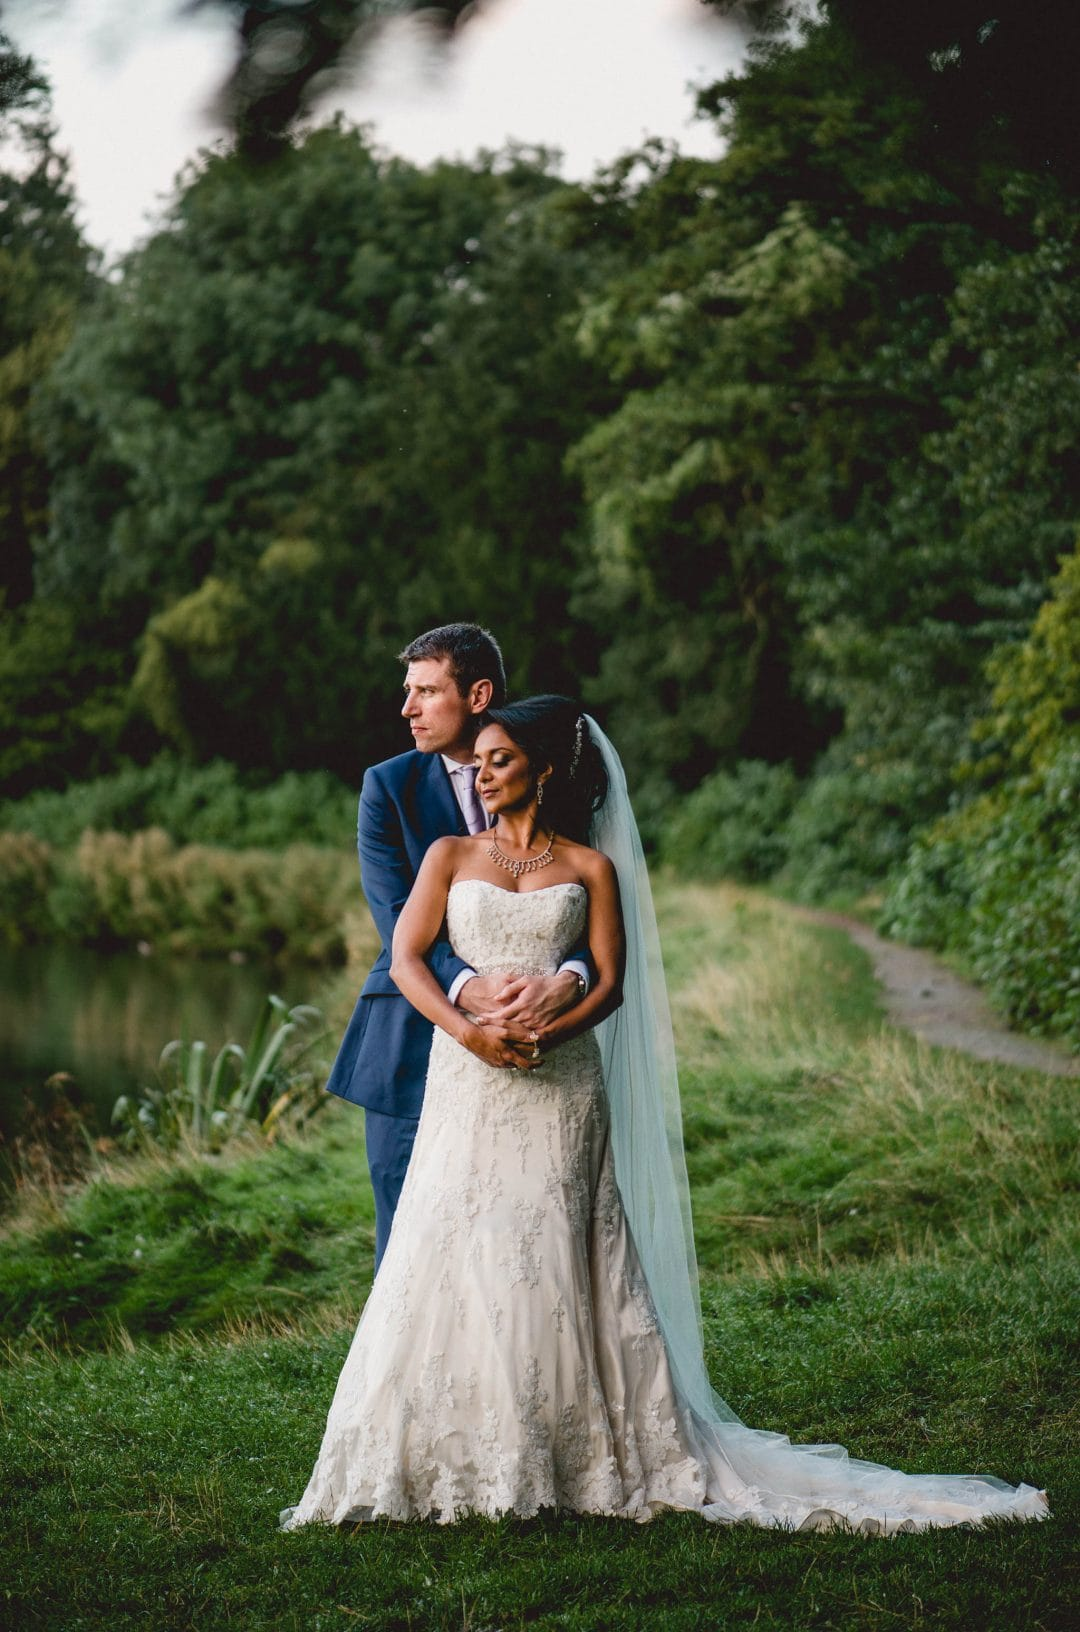 Shruti and Sam's Elegant Wedding at Eastnor Castle – Part 1